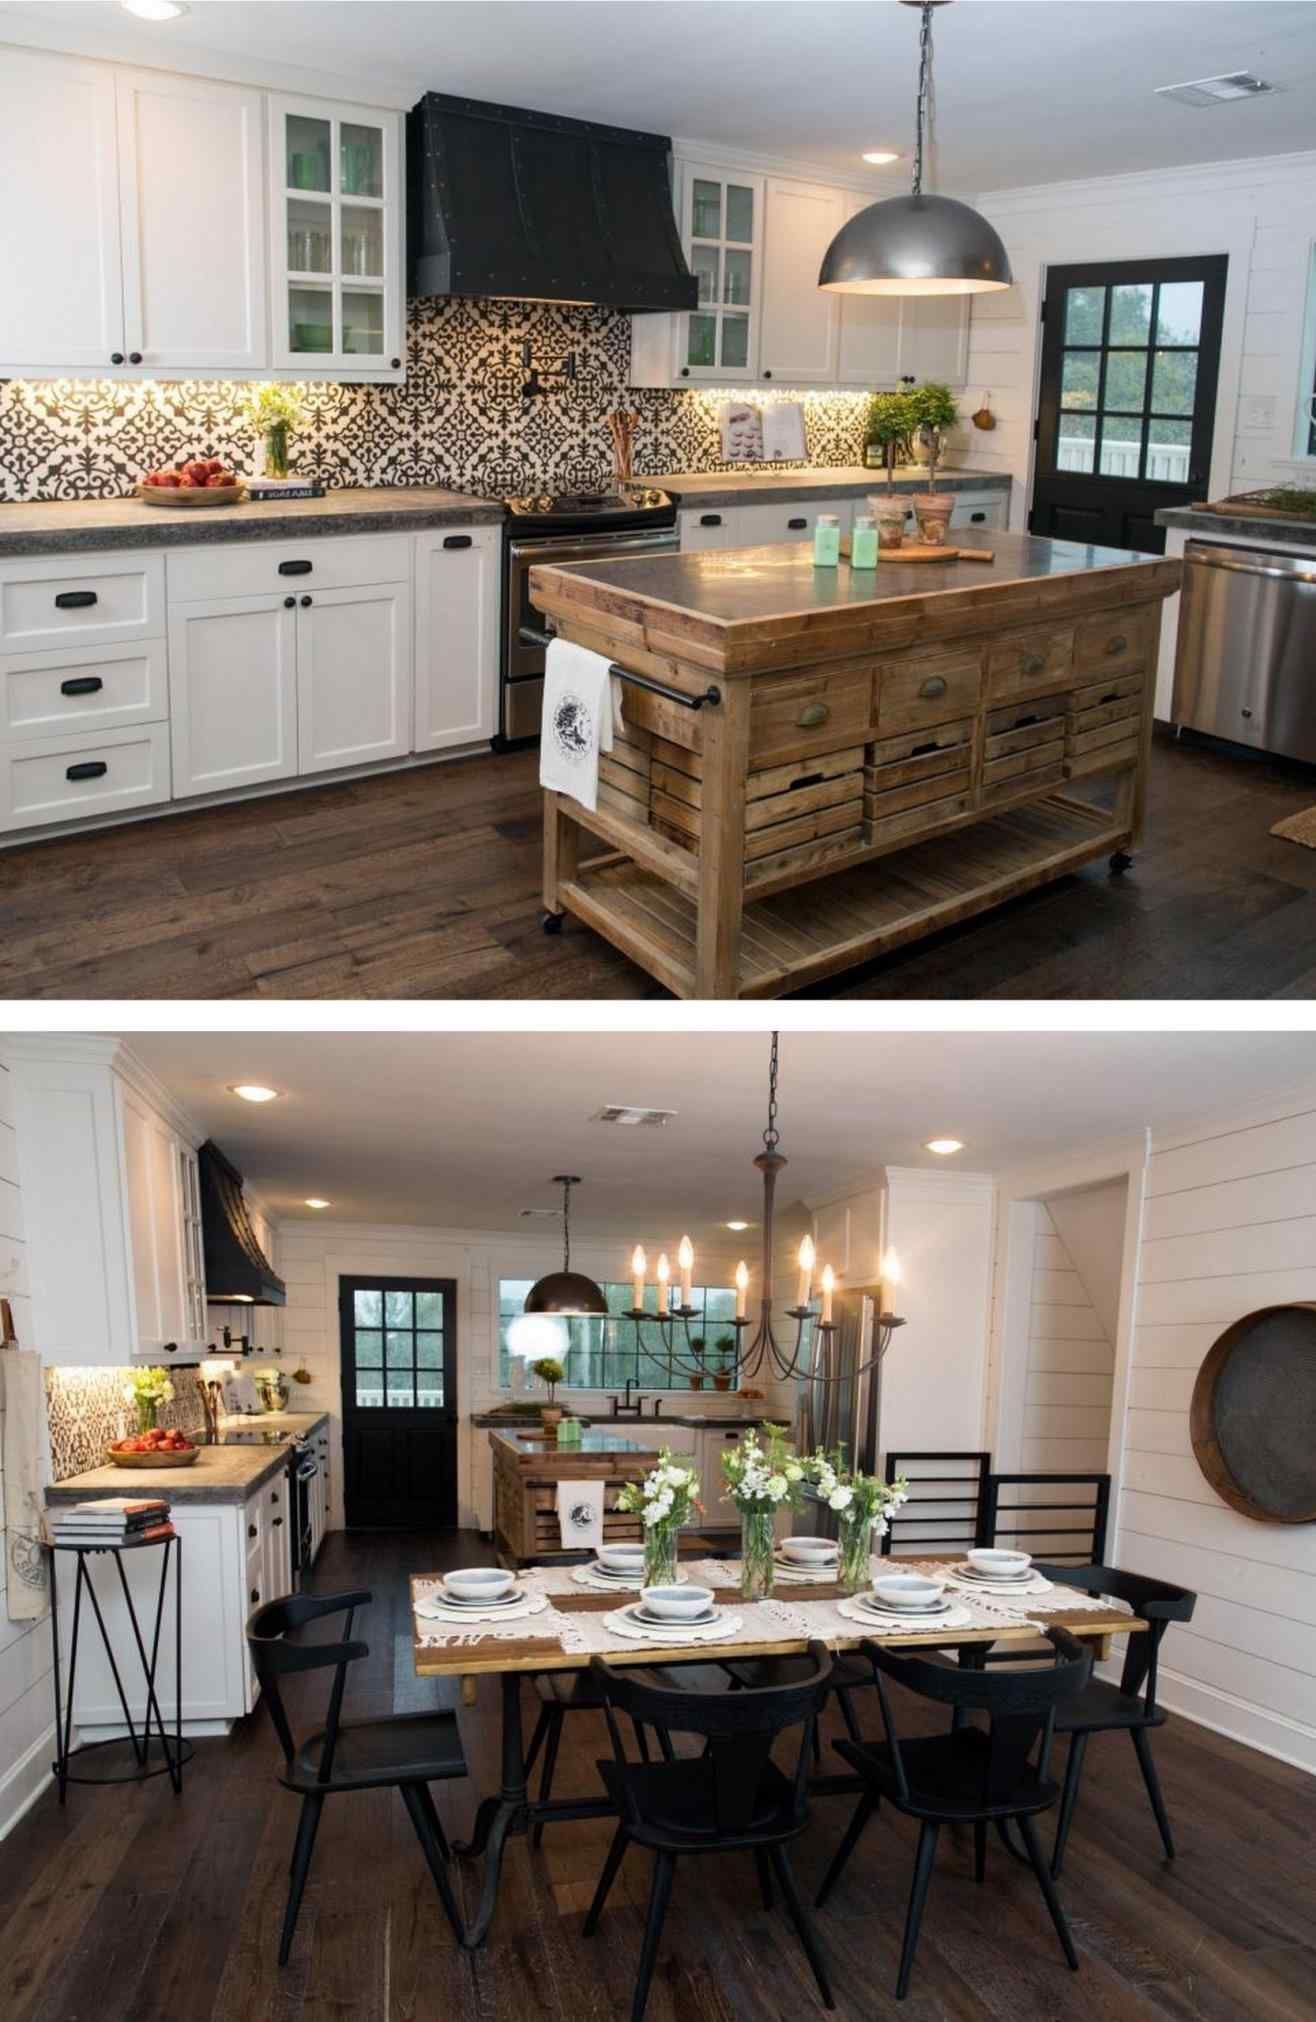 By for a rhcheatsheetcom shockingly joanna gaines kitchen designs